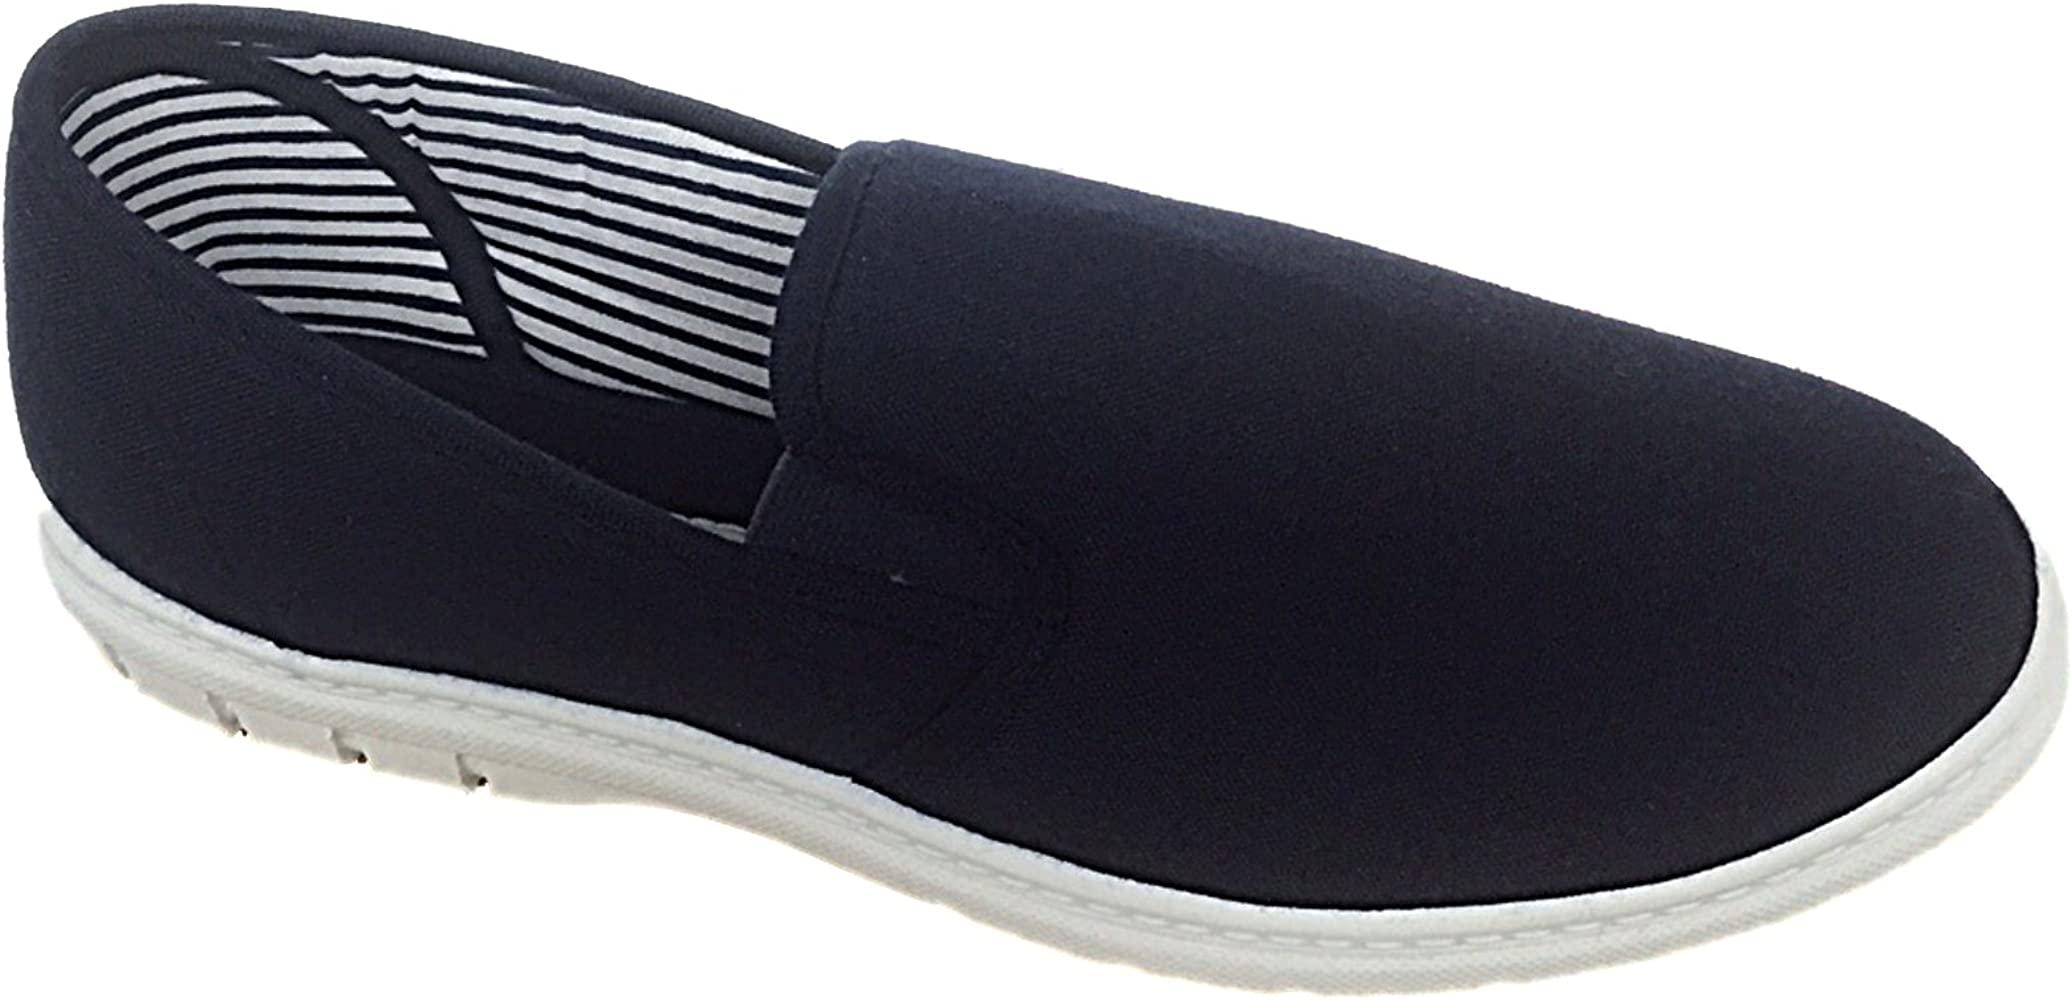 Size 9 UK Mens Shoe Tree BRETT Canvas Slip On Wider Fit Plimsoll Pump Trainer Slipper Deck Shoe Size 6-12